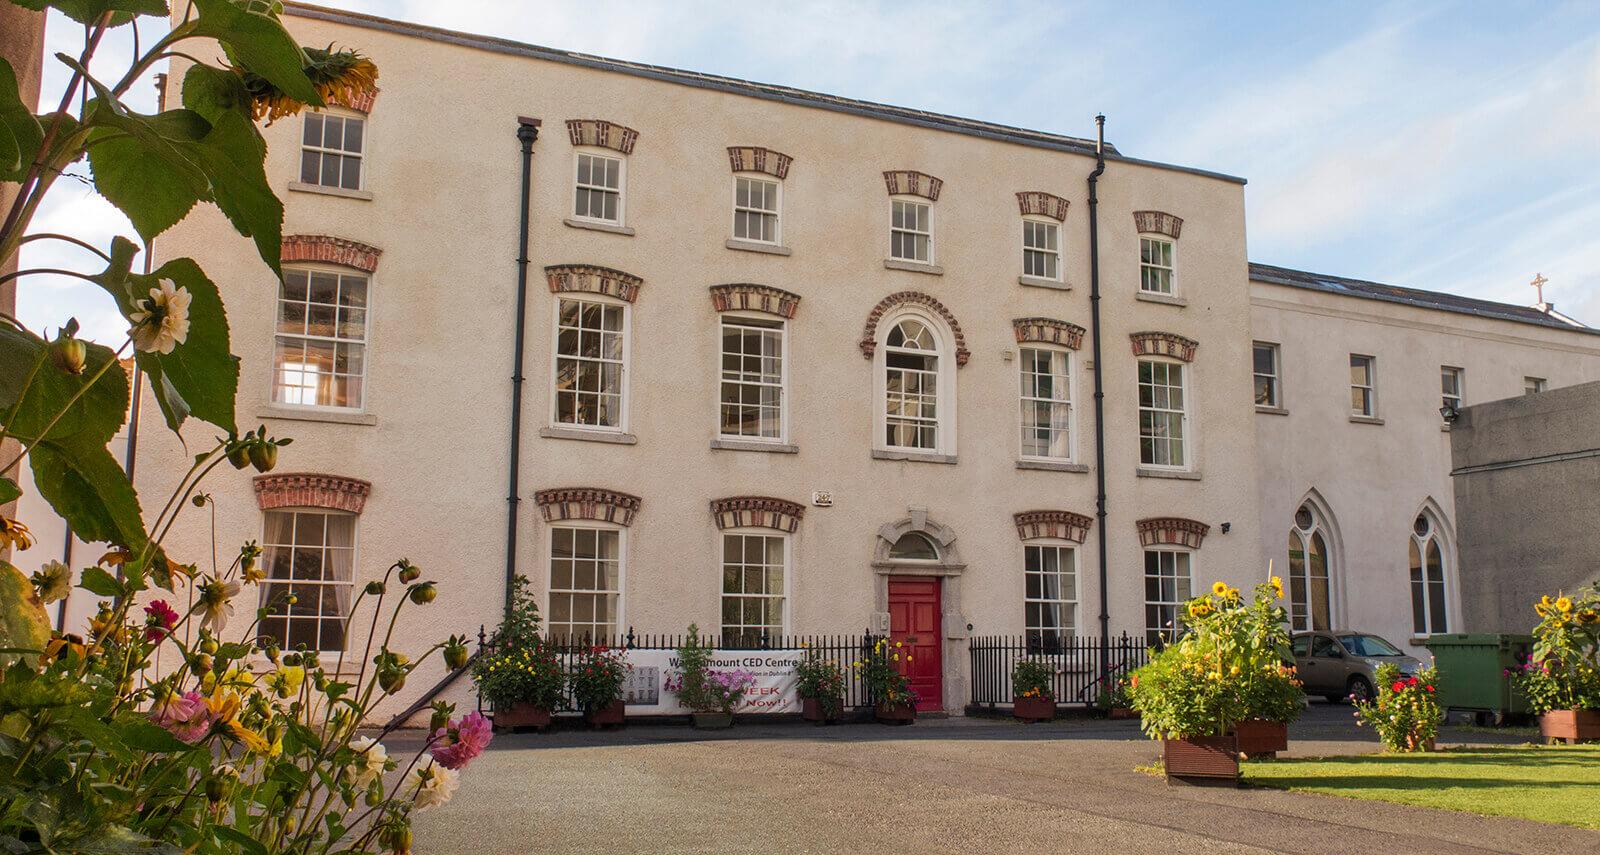 warrenmount-community-education-centre-building-our-place-about-us